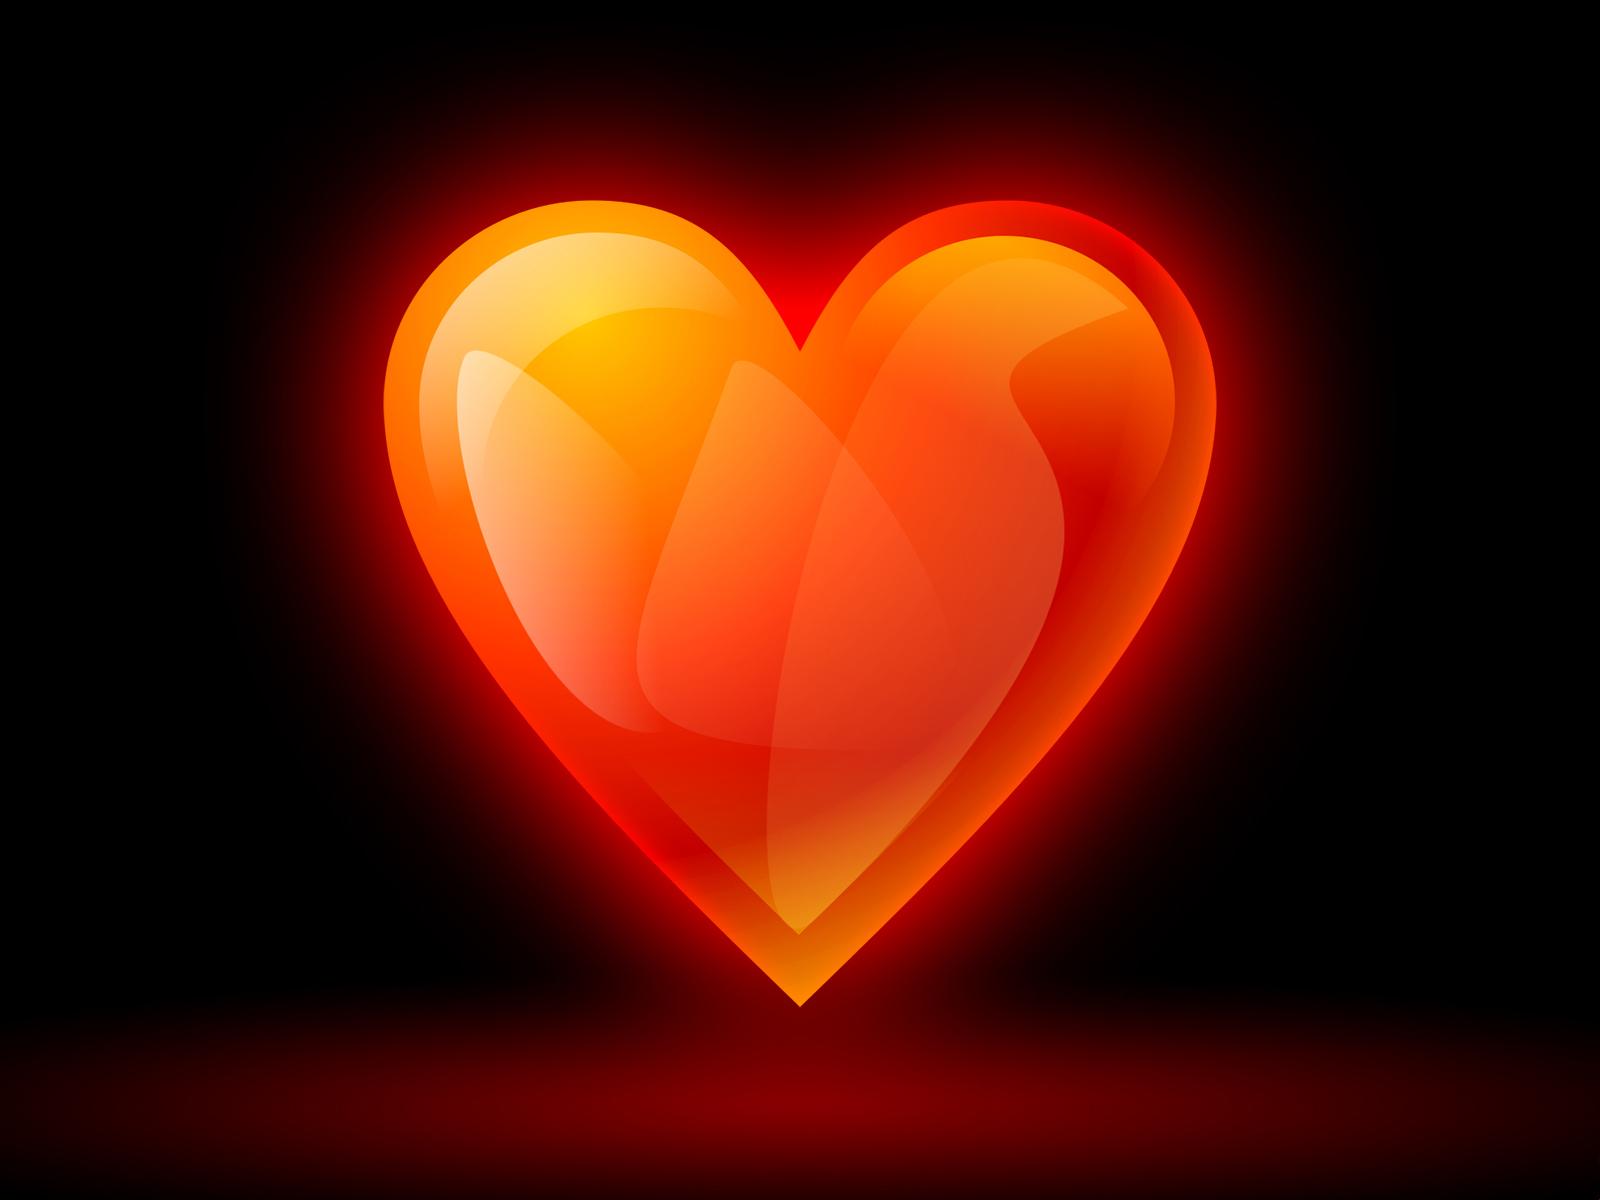 Love Heart Pictures Wallpaper:Computer Wallpaper | Free ...